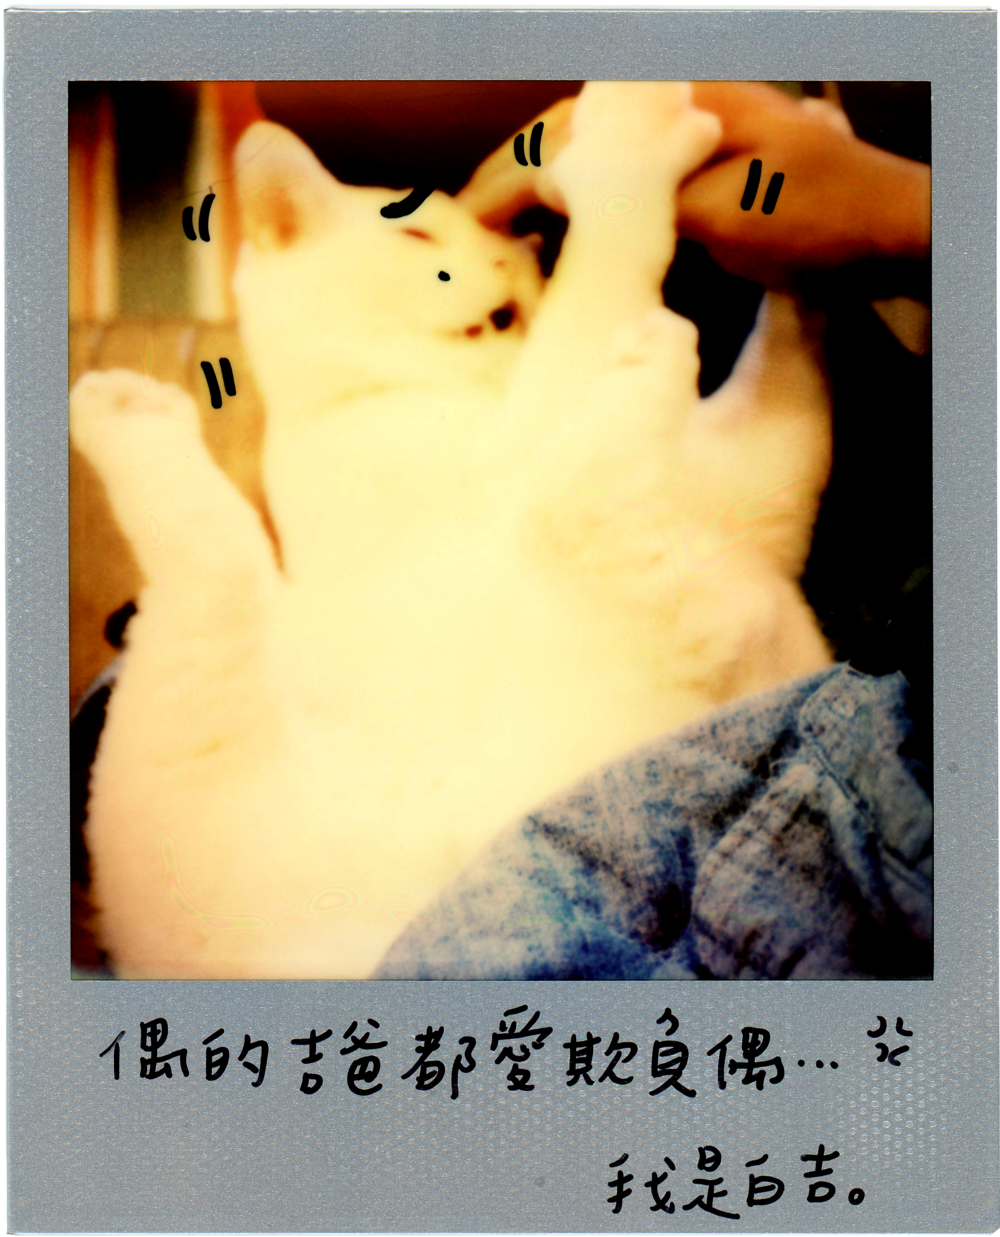 0707-2014-白吉-字.png